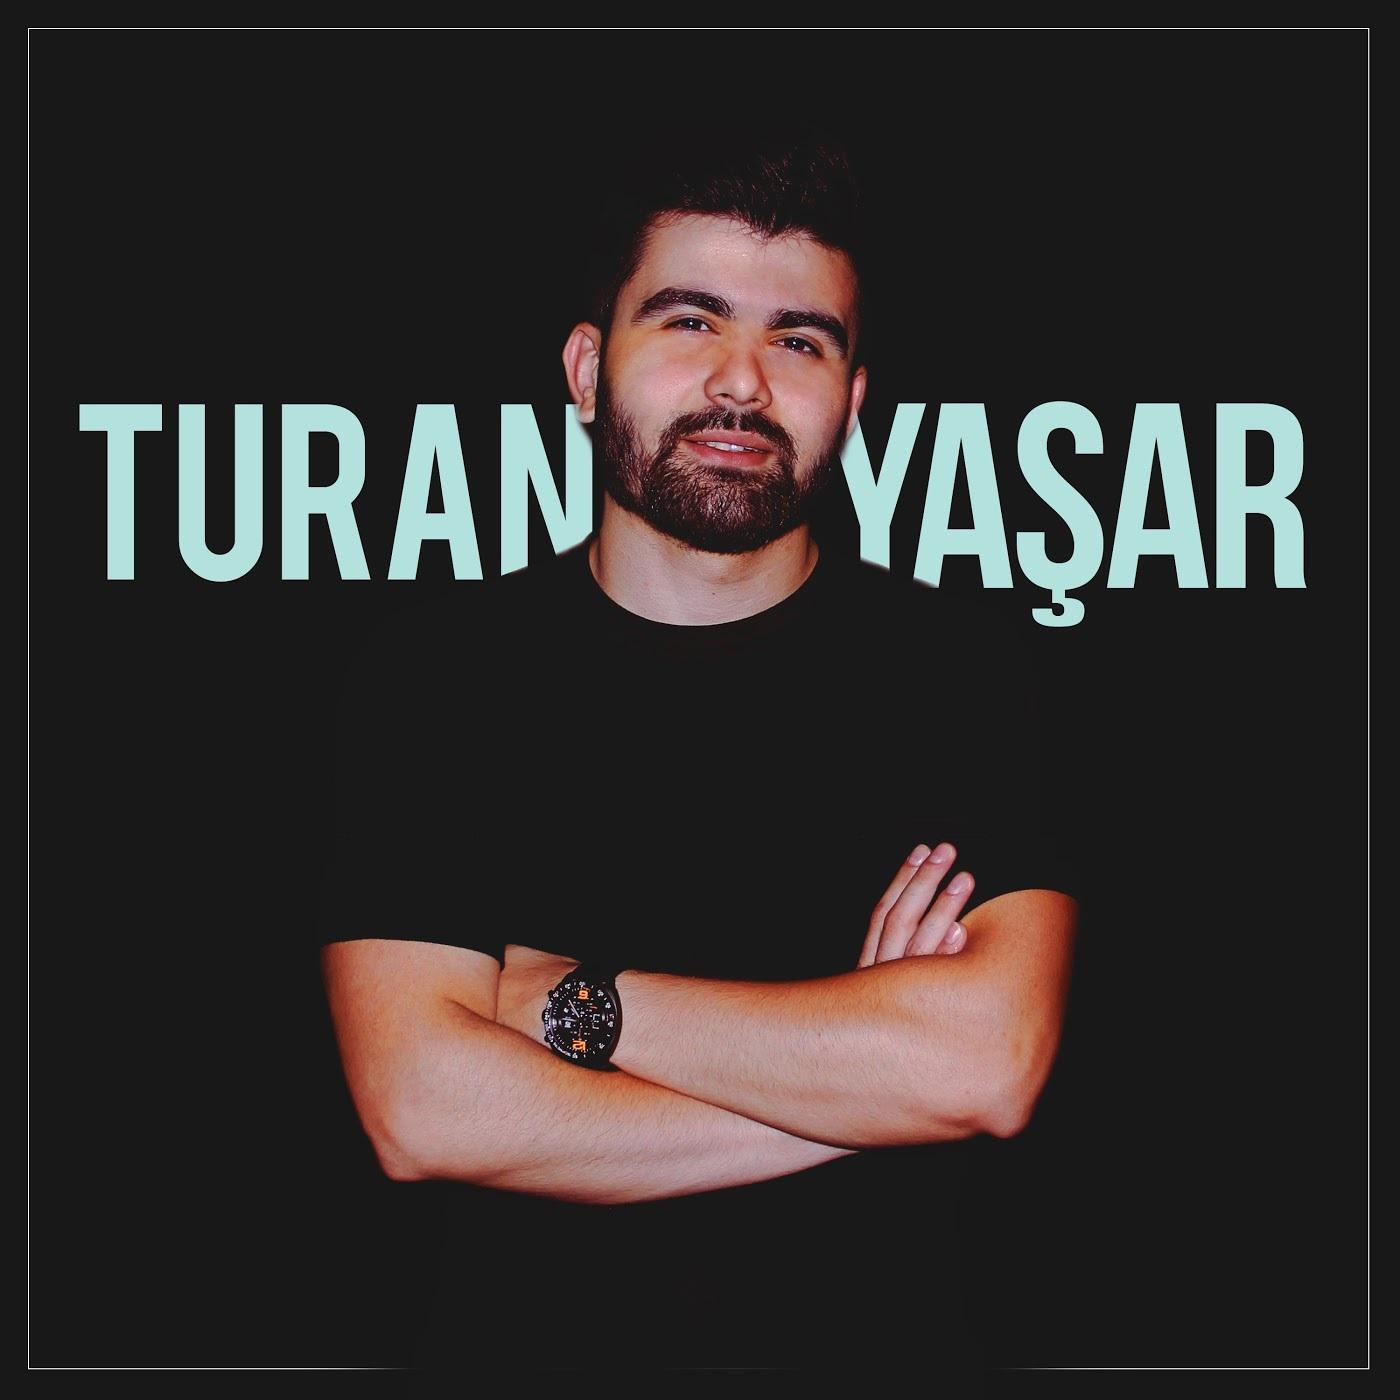 http://s6.picofile.com/file/8385837326/30Turan_Yasar_Mashup_2019.jpg